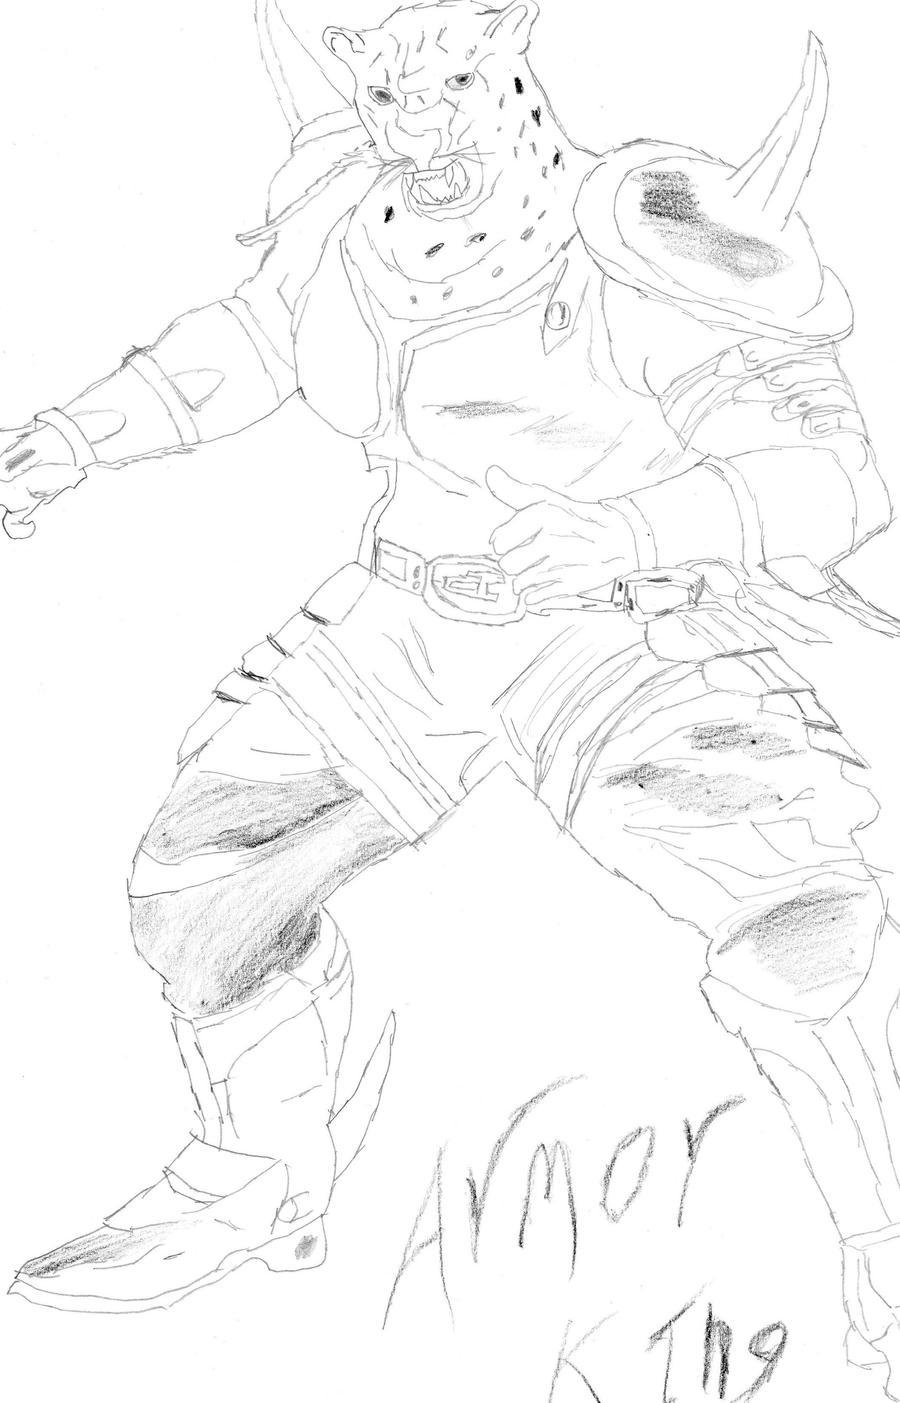 Armor King Tekken Drawing By Mick81 On Deviantart